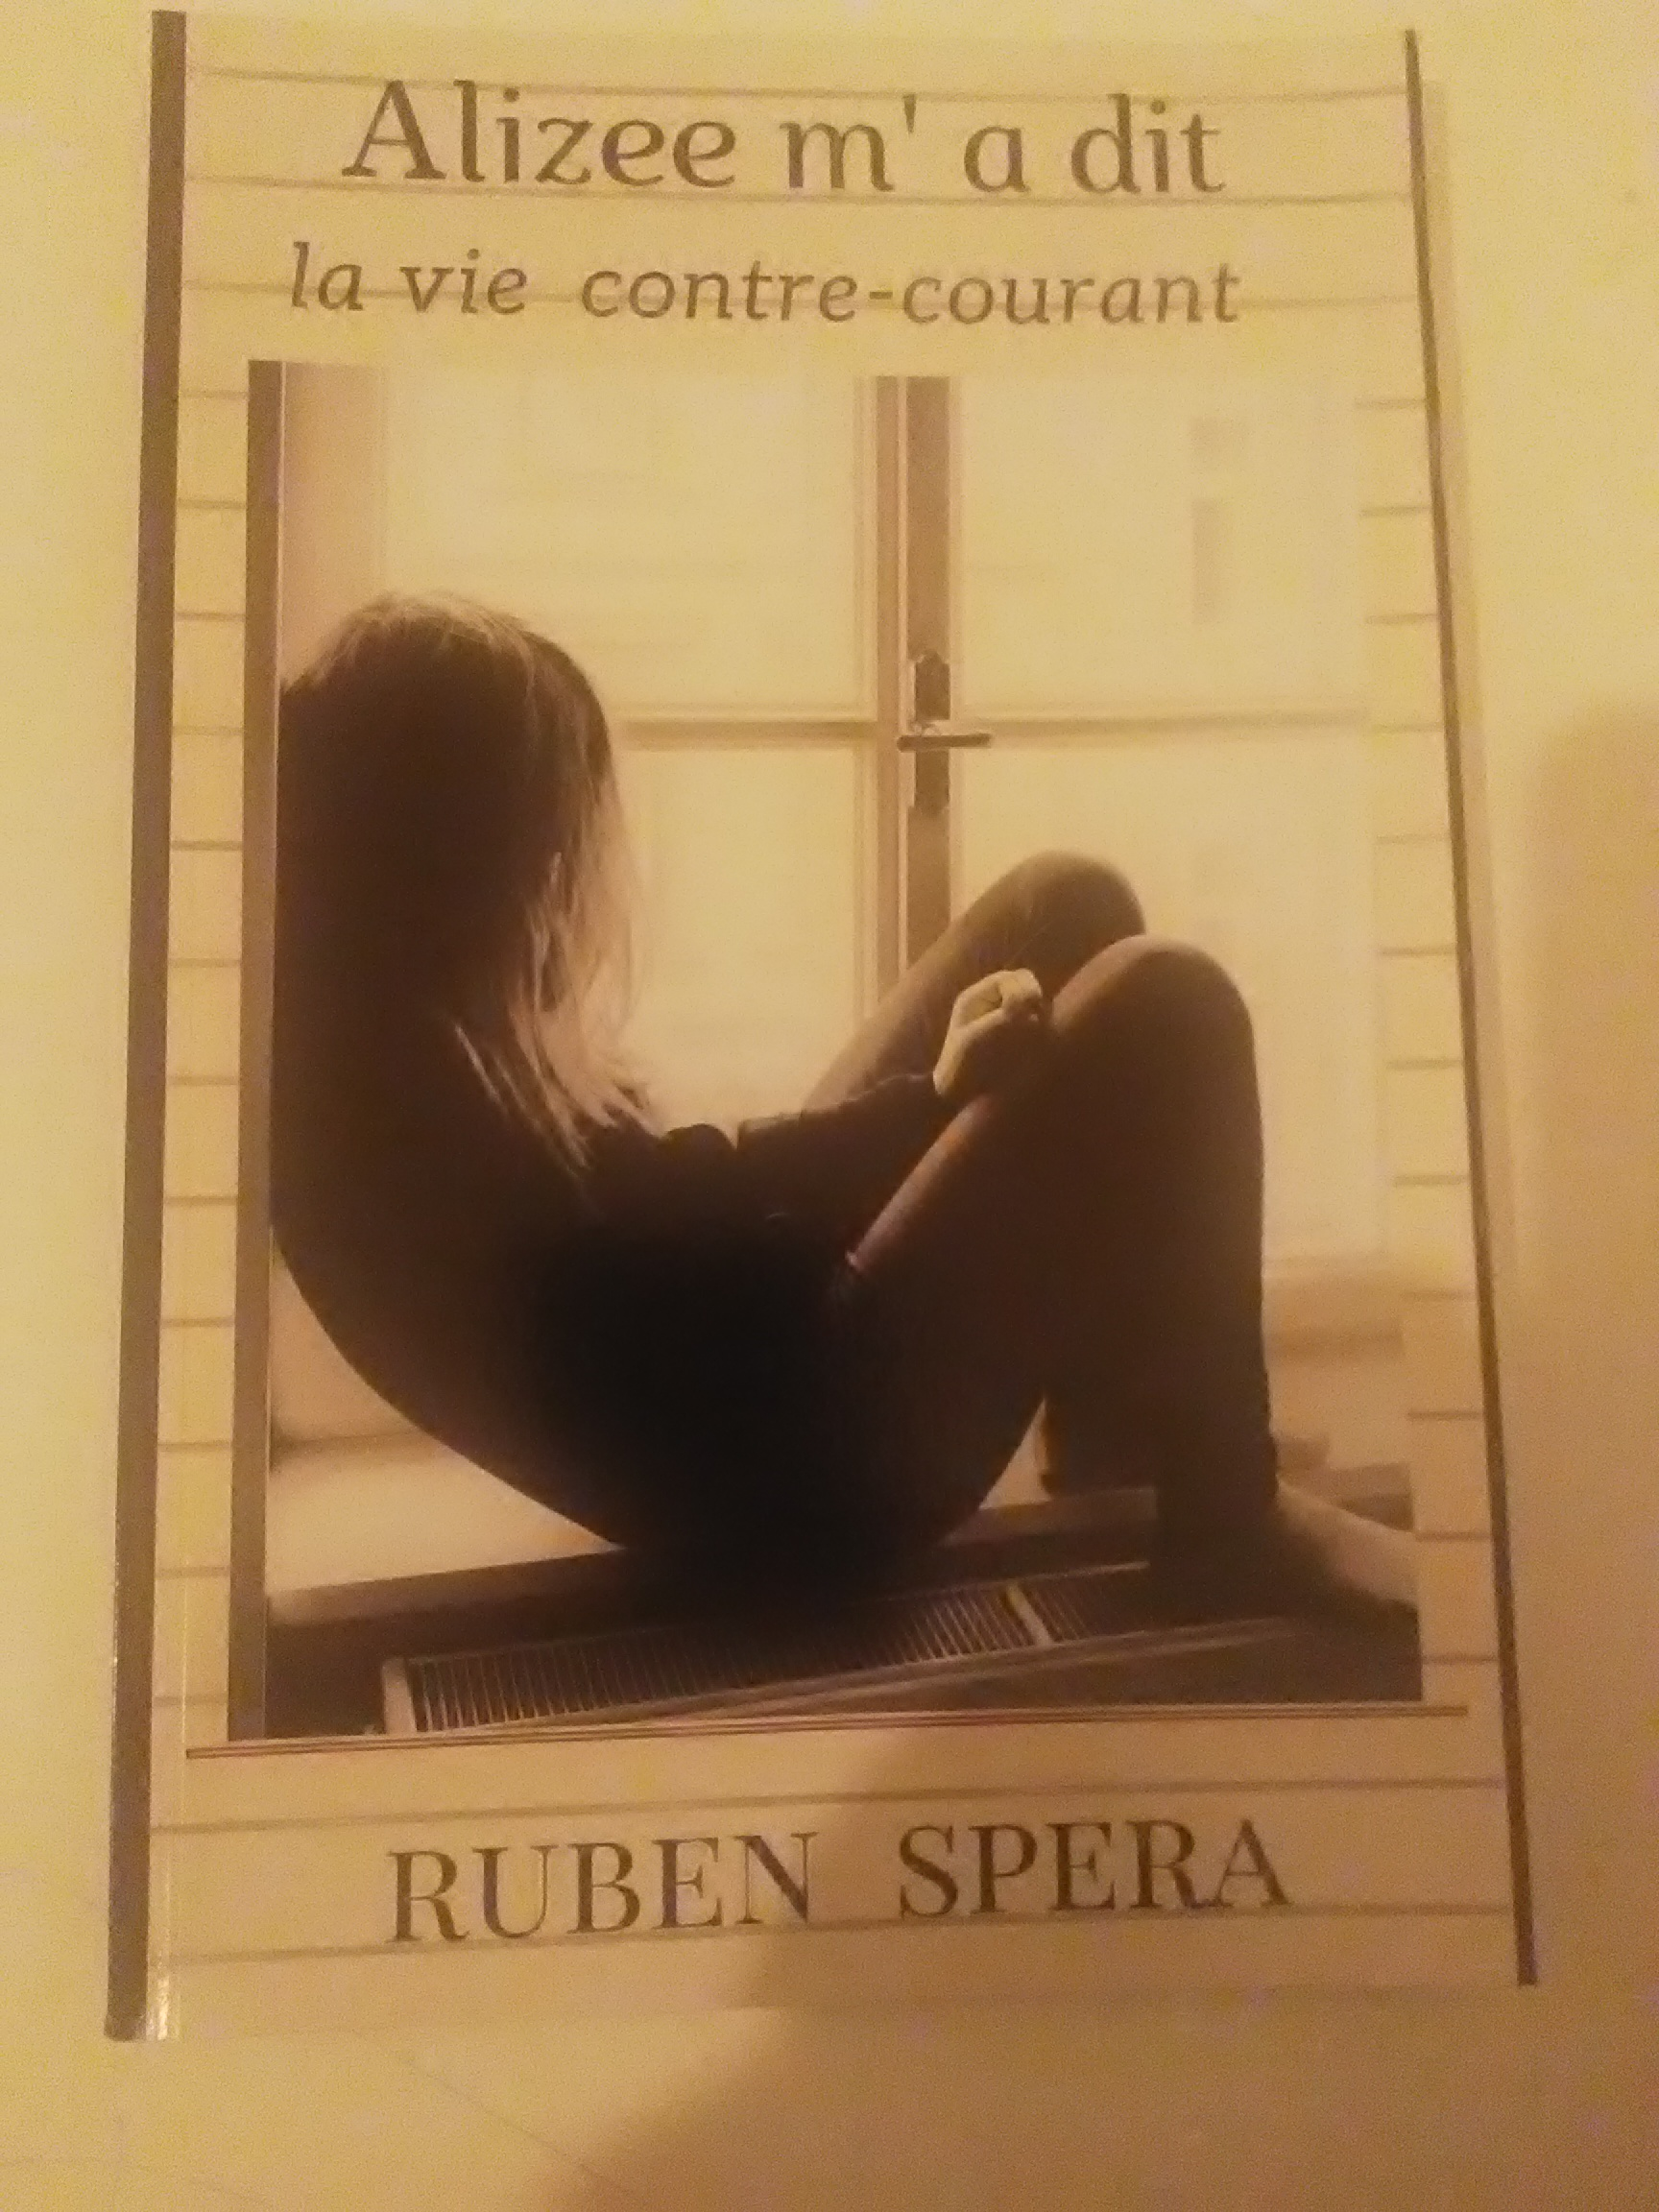 Ruben Spera